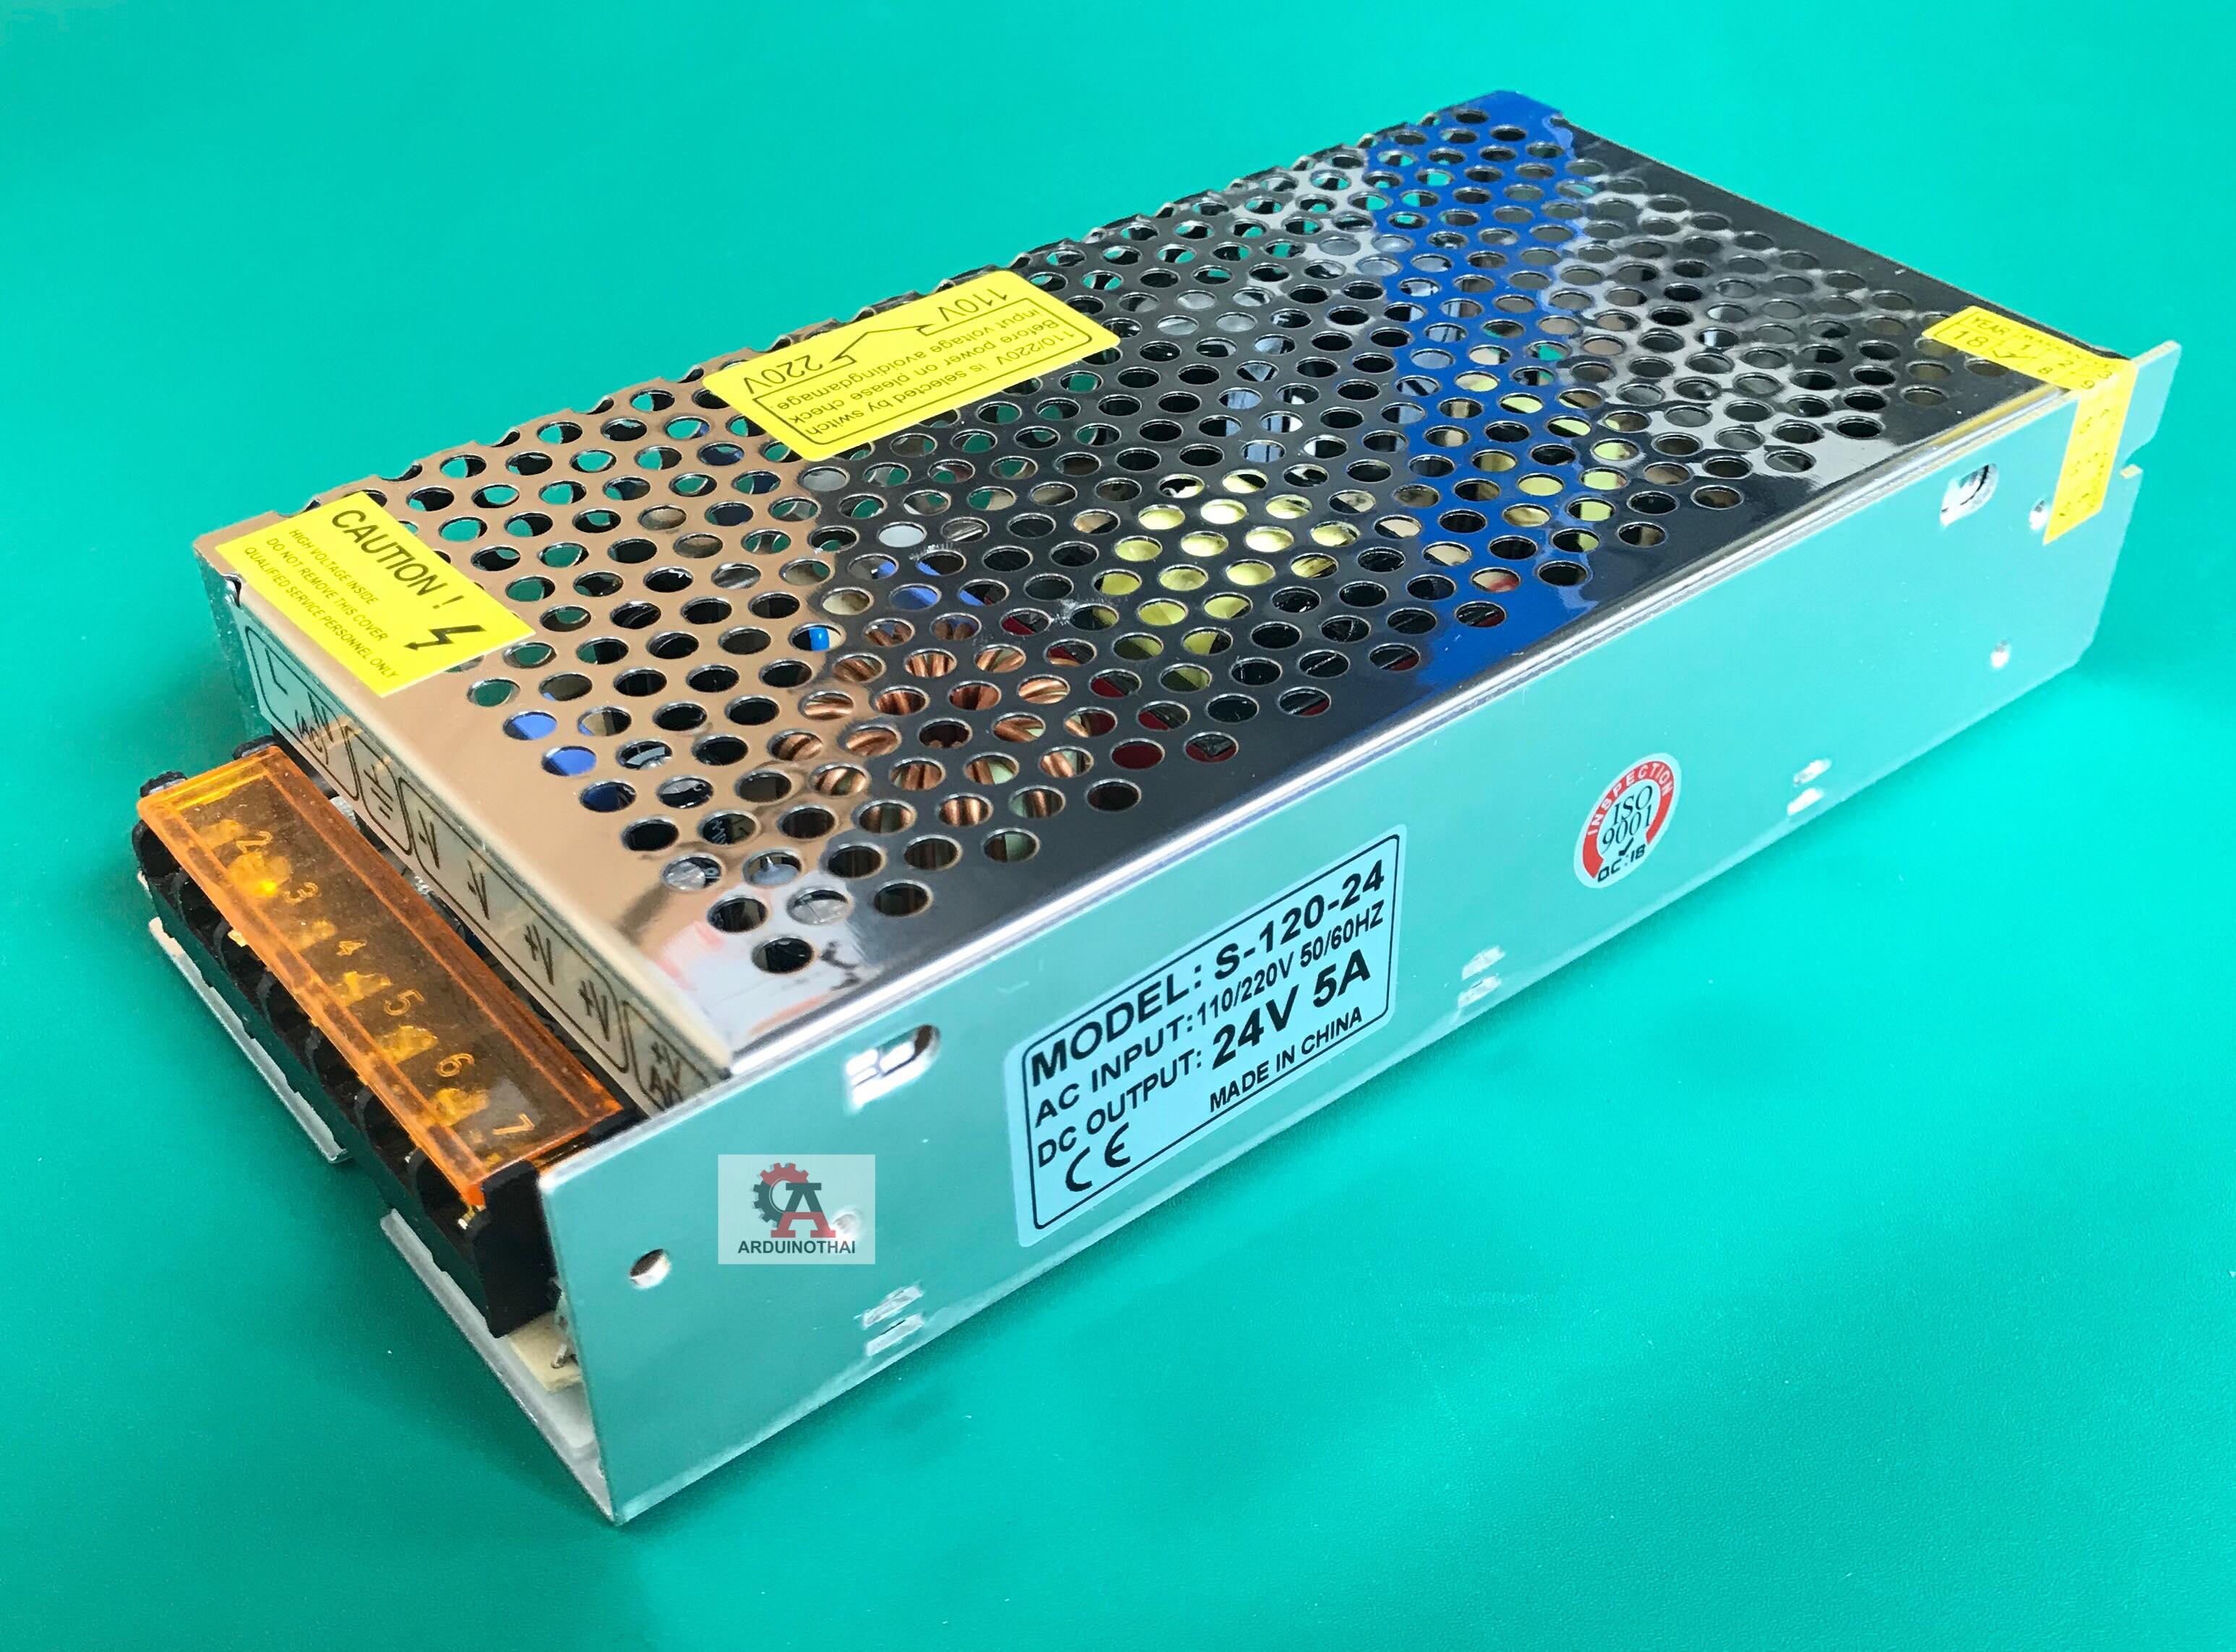 Switching 24V 5A แหล่งจ่ายไฟ 24V 5A